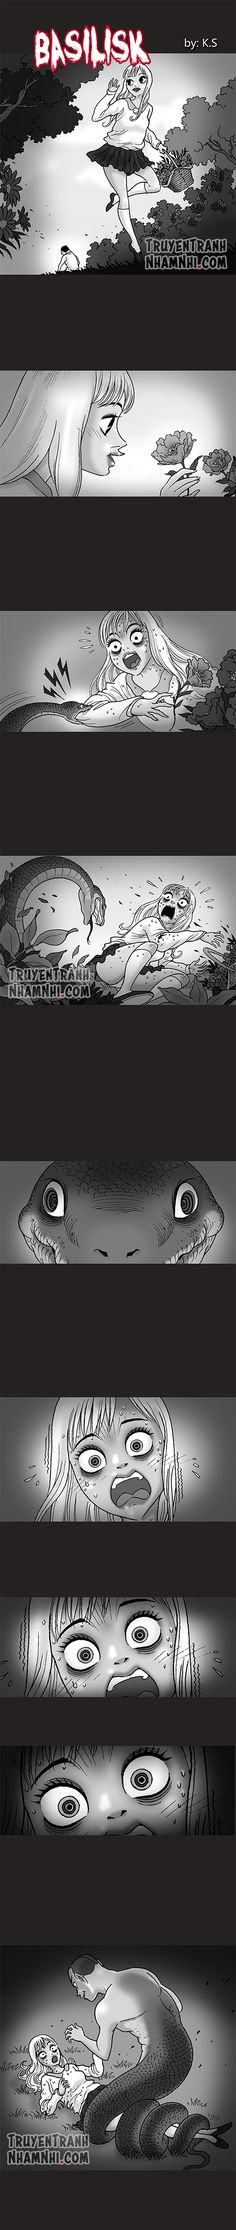 Silent Horror chap 177: Basilisk (Đứa con của rắn)